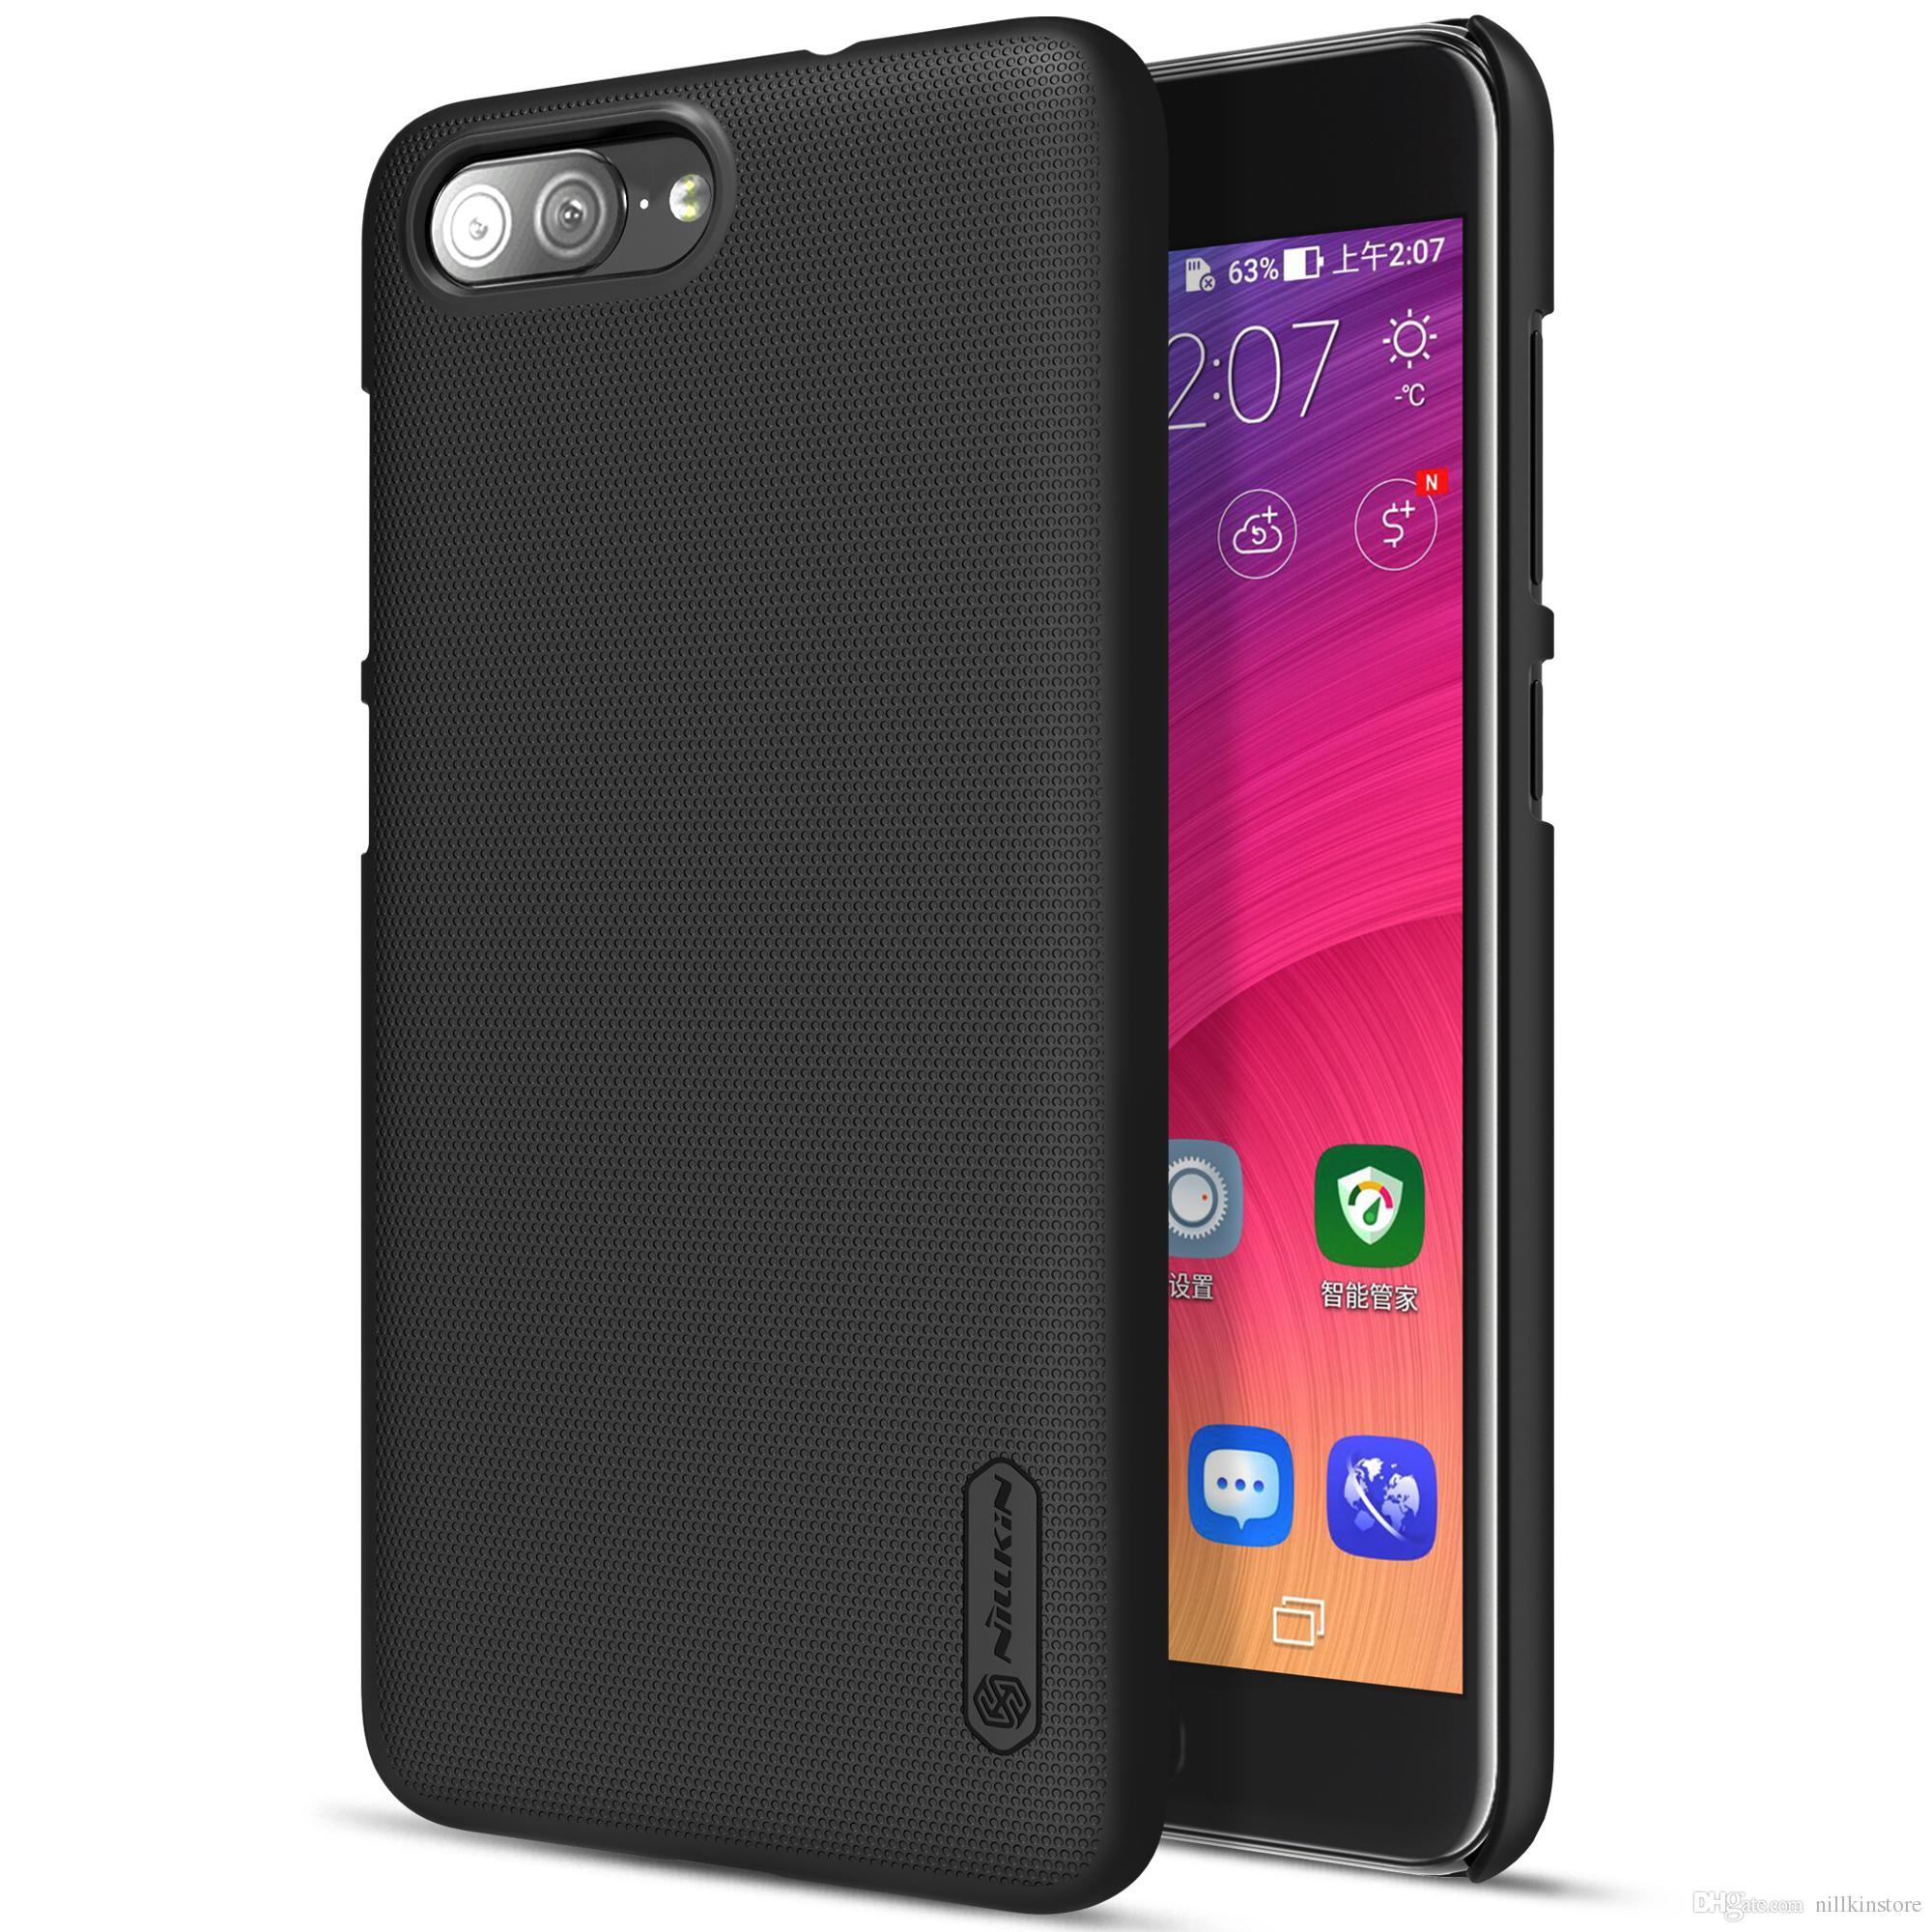 Handyhullen Htc One Nillkin Case Fur Asus Zenfone 4 Max Plus Zc550tl Frosted Shield Cover Geschenk Displayschutzfolie